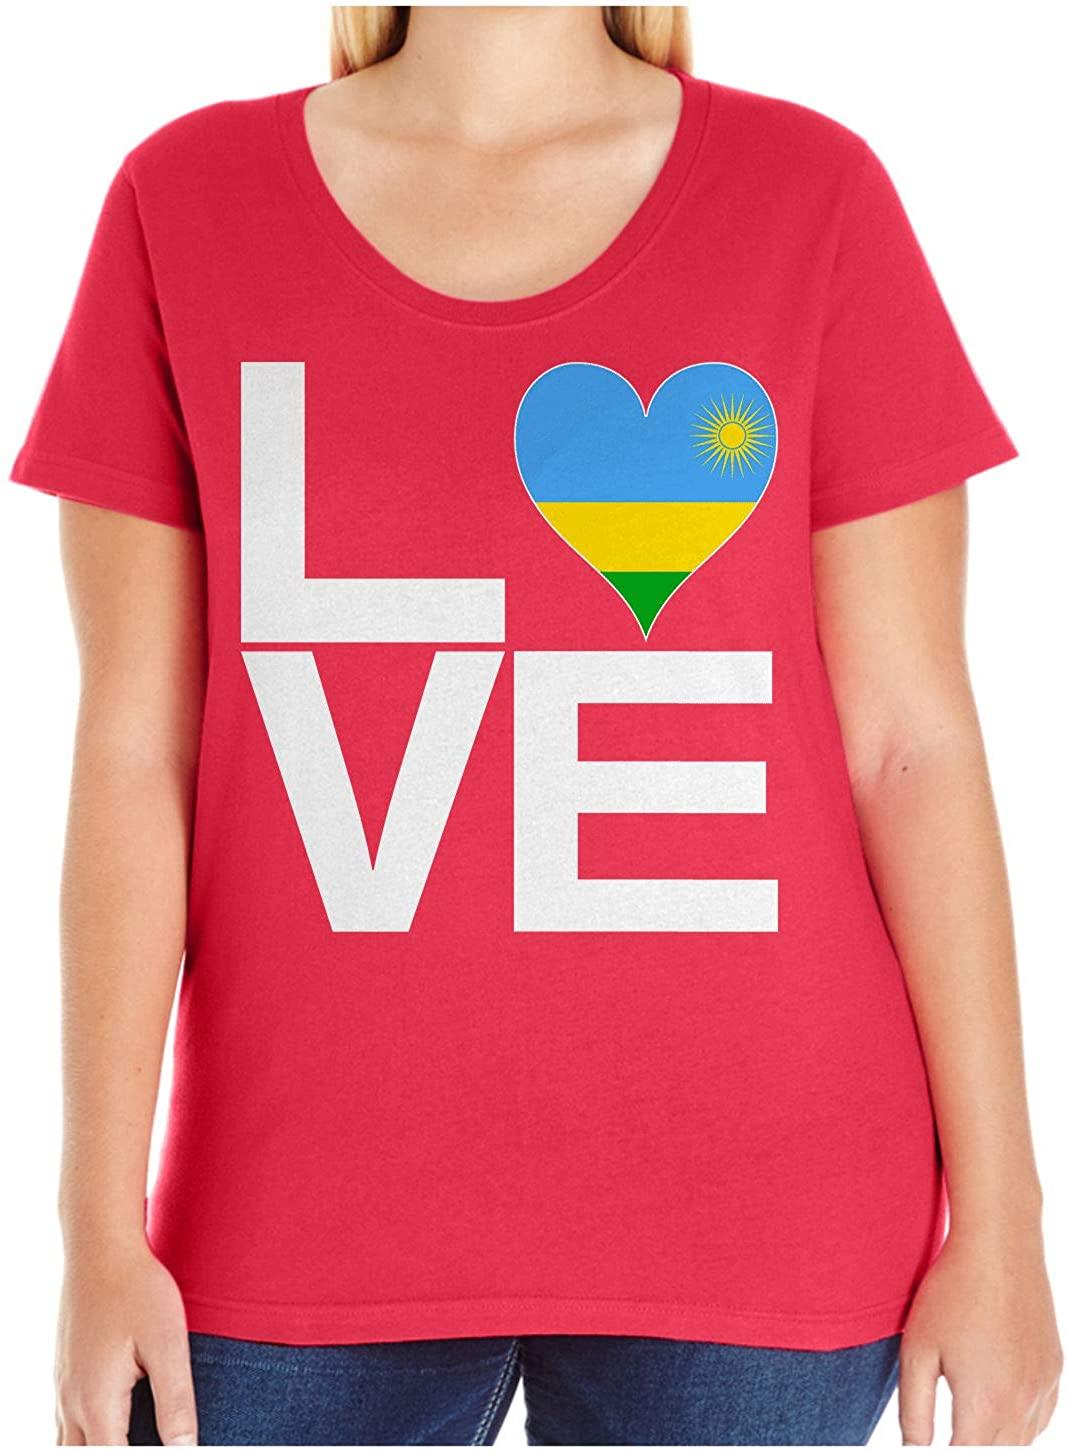 HARD EDGE DESIGN Women's Love Block Rwanda Heart Plus Size Scoop Neck T-Shirt, Size 1, Red